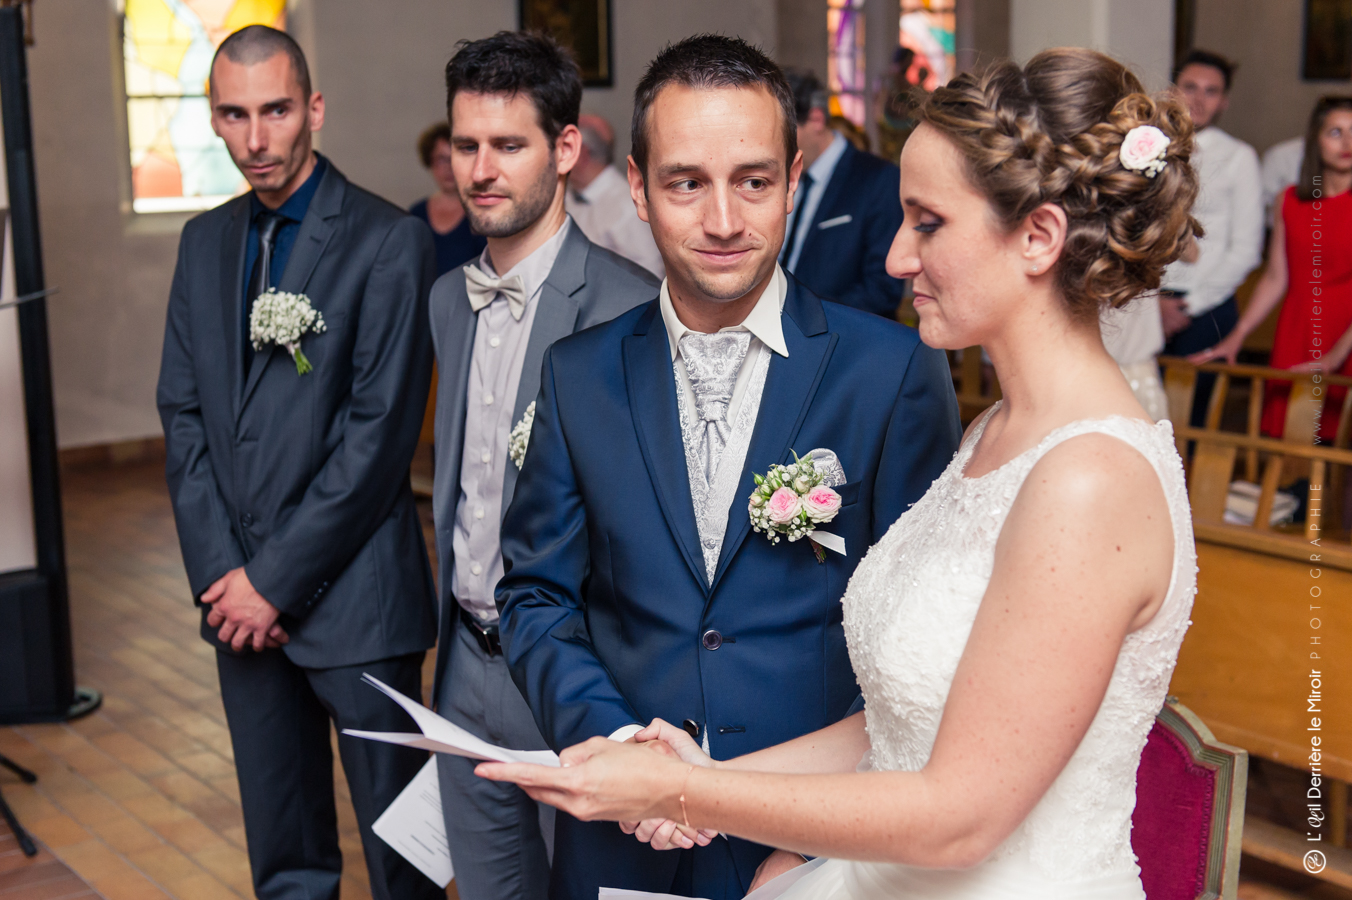 mariage-cj-vaugrenier-loeilderrierelemiroir-039